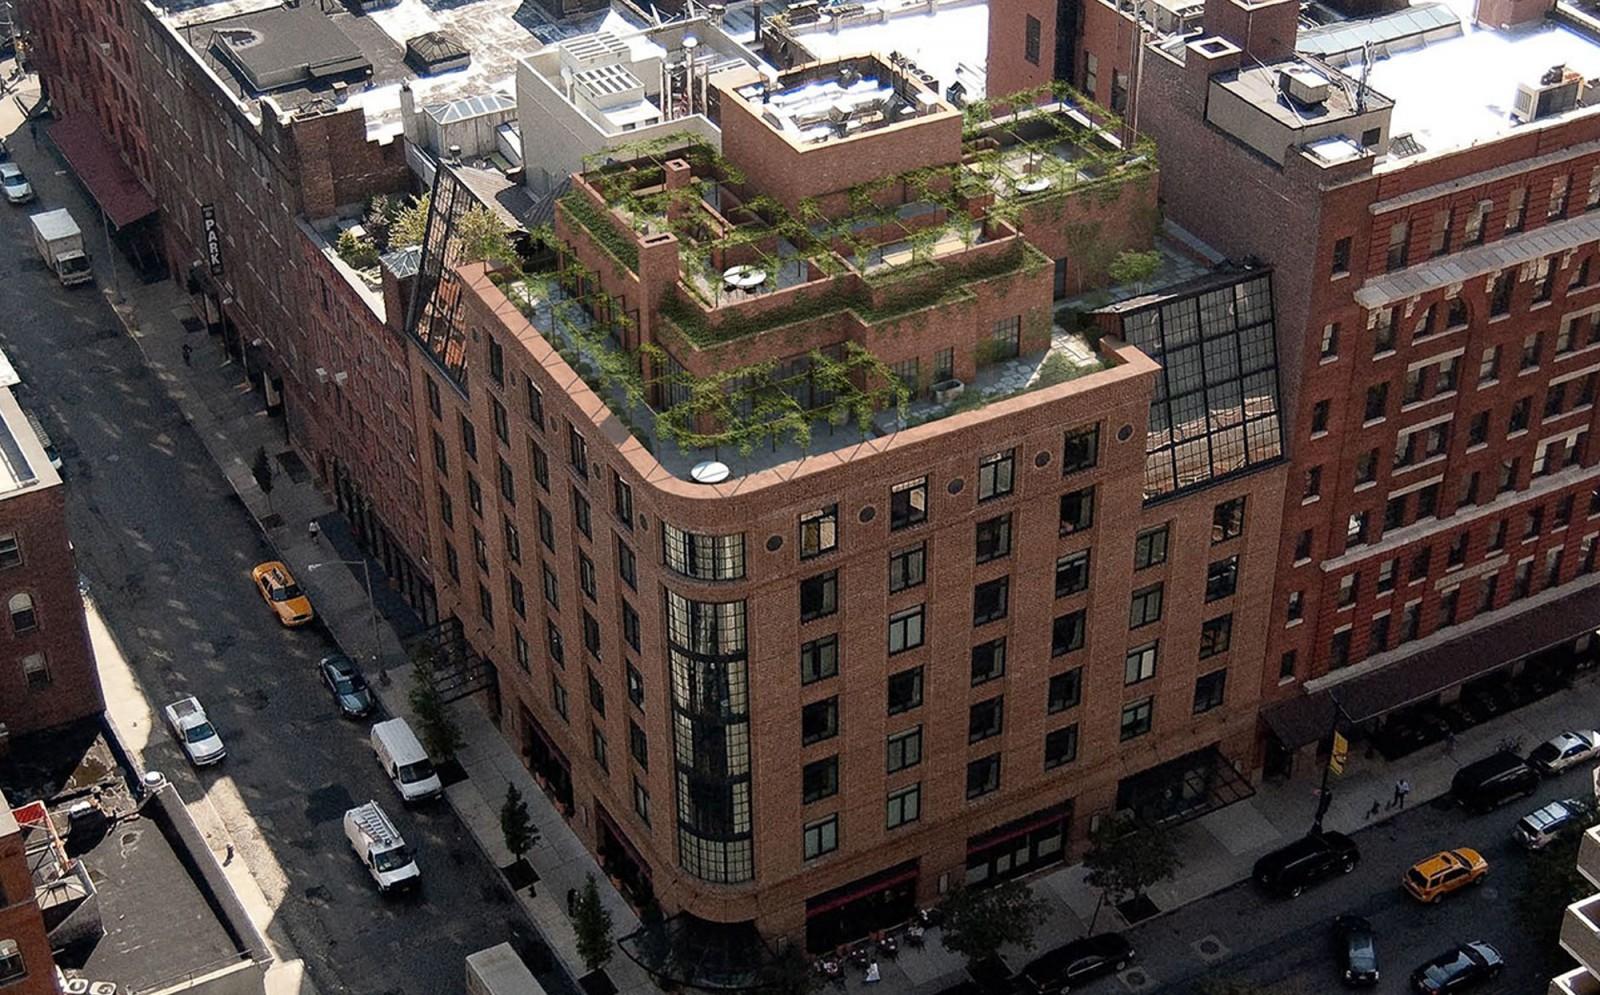 Wood Canopy Bed Tribeca Penthouse Tribeca Luxury Hotel Axel Vervoordt